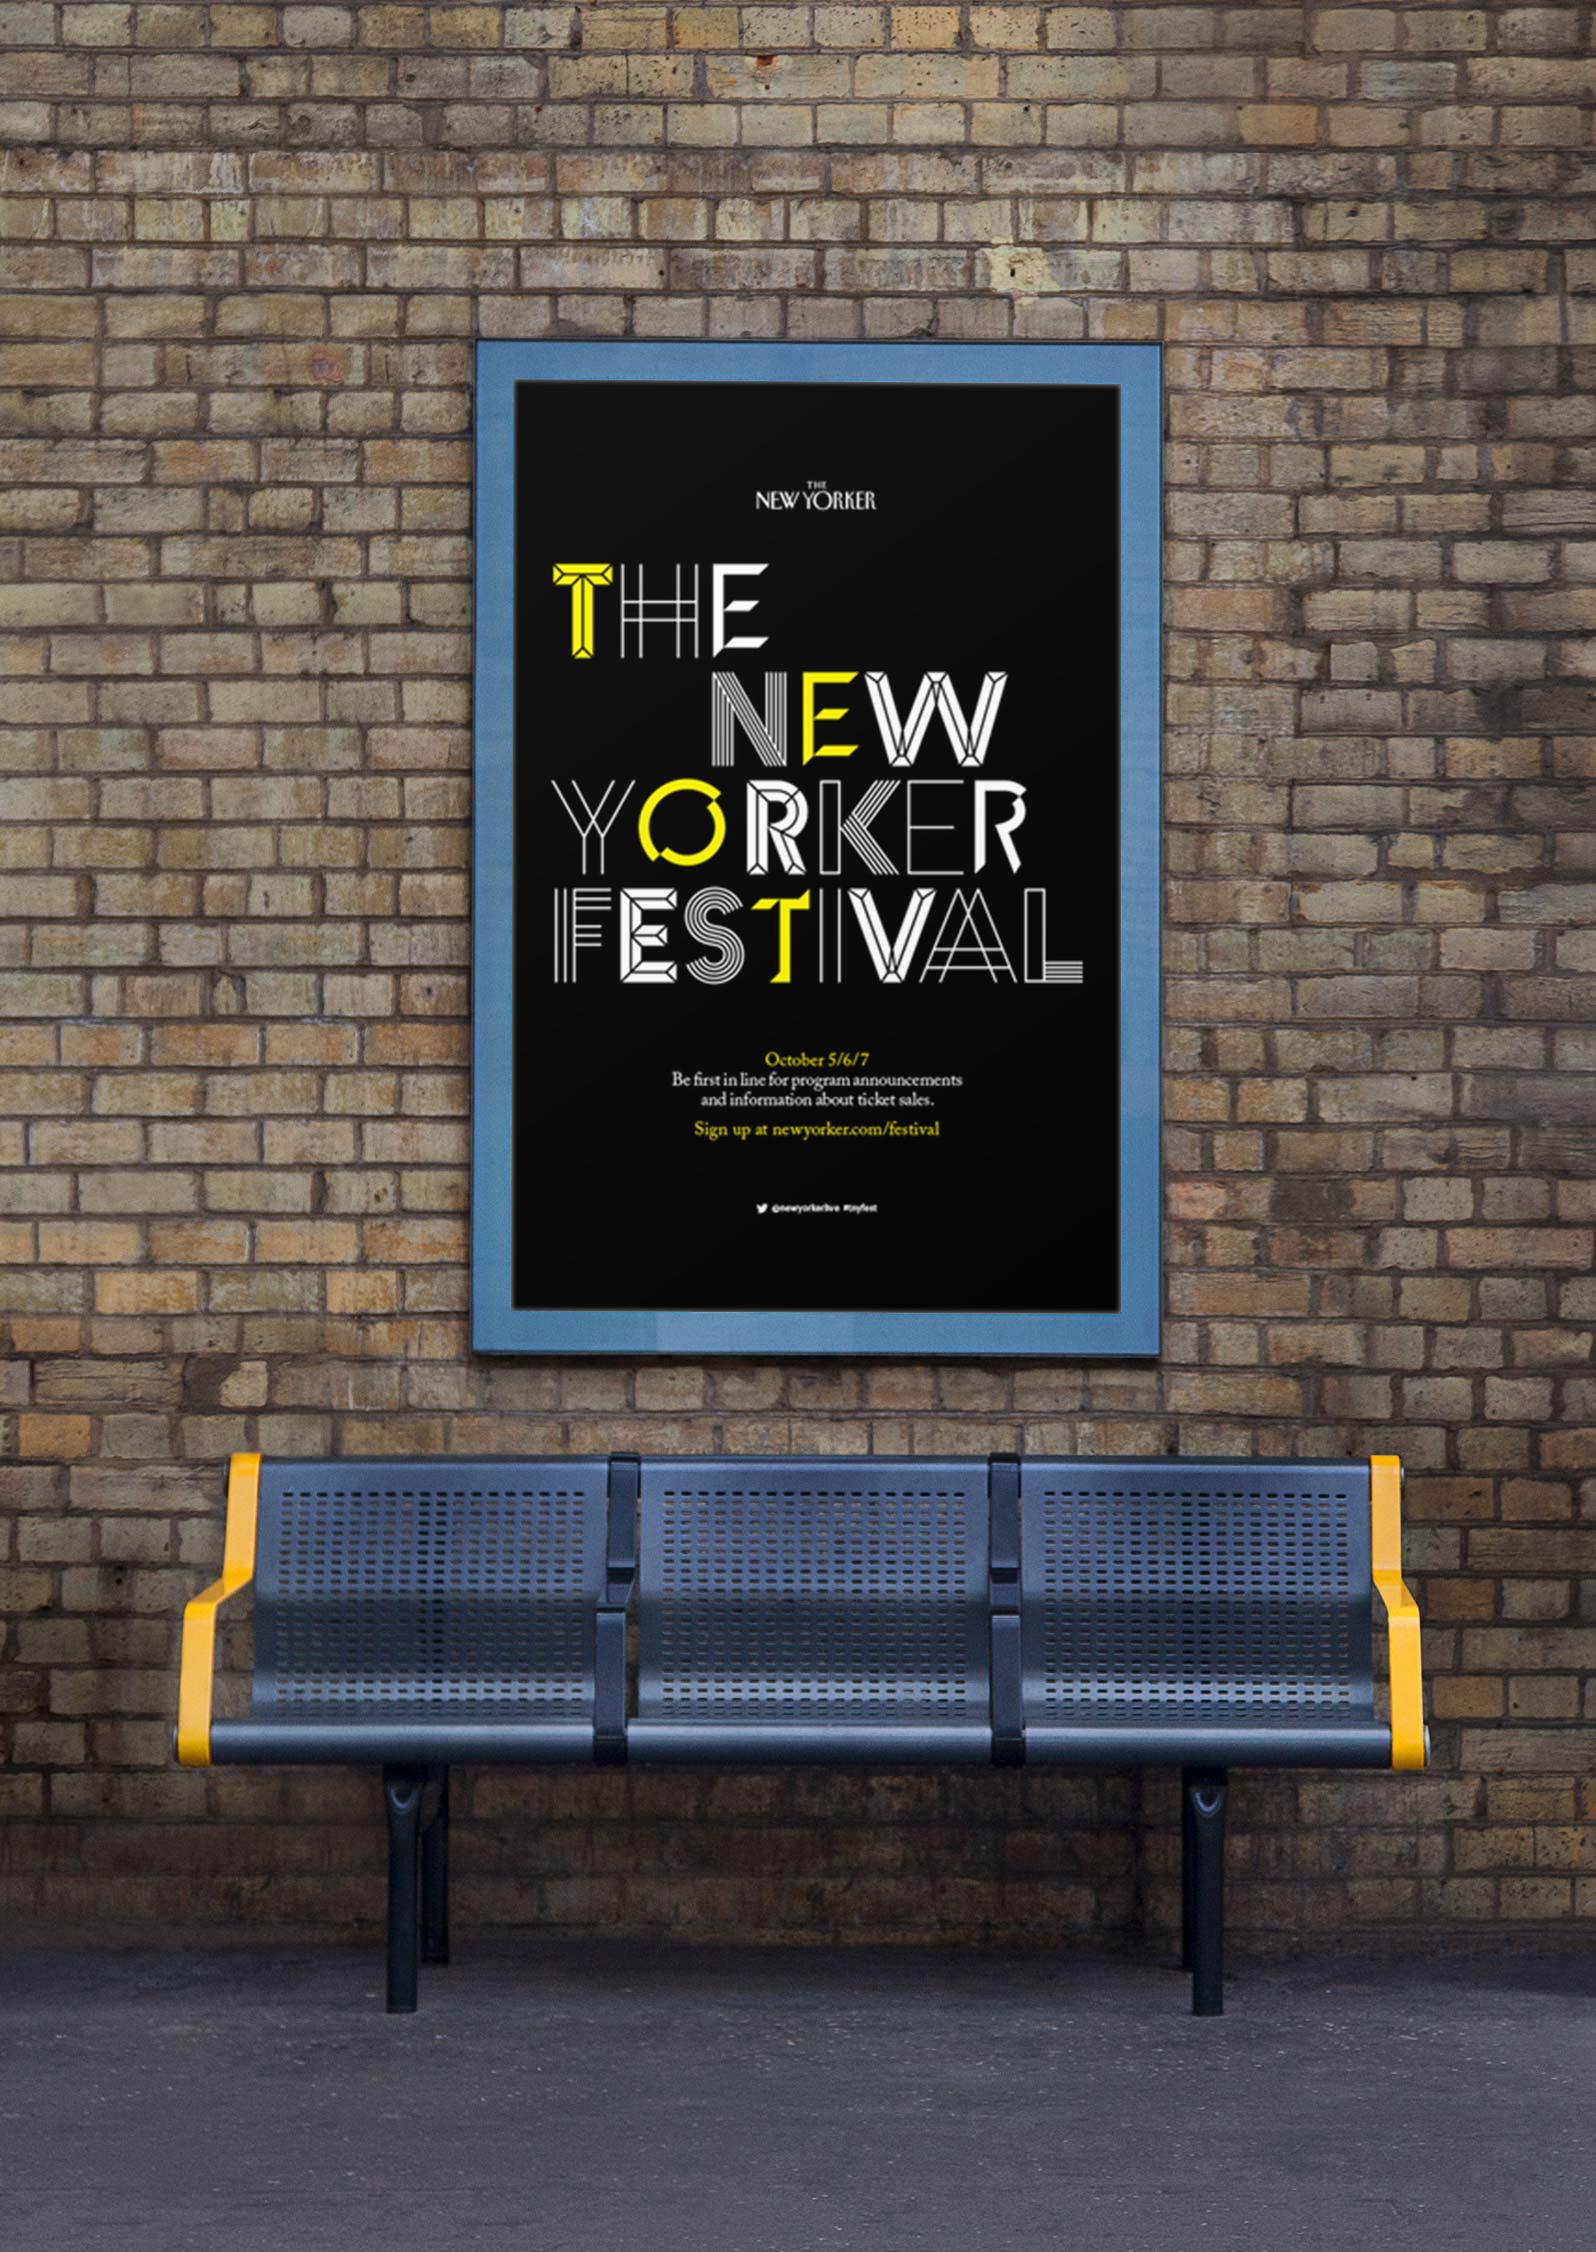 TNY_Fest_signage_outdoor.jpg